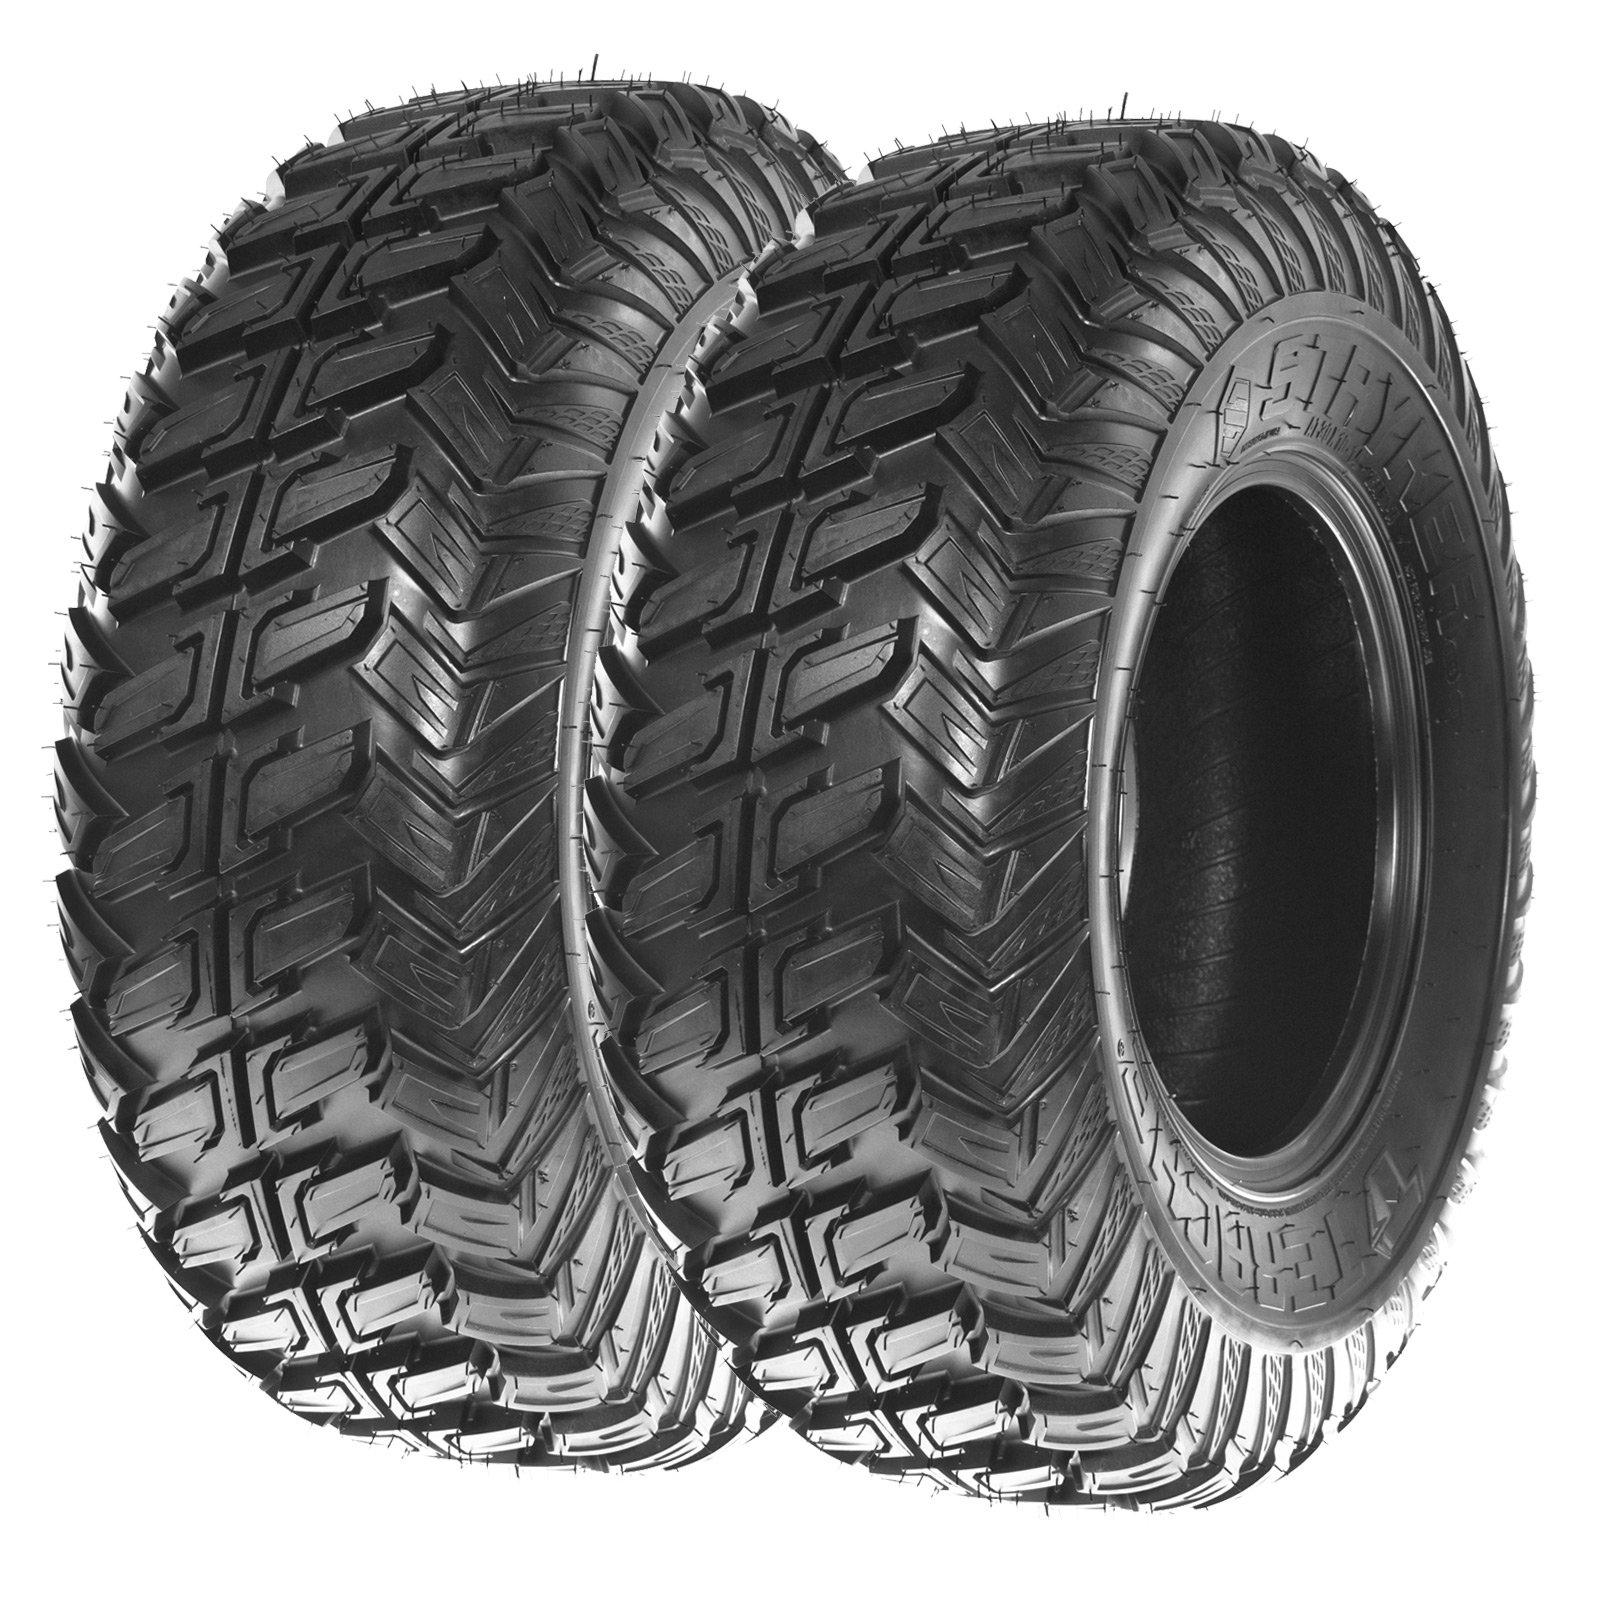 Terache STRYKER AT Radial ATV UTV All Terrain Tires 32x10R15 32x10x15 8 Ply (Set pair of 2)